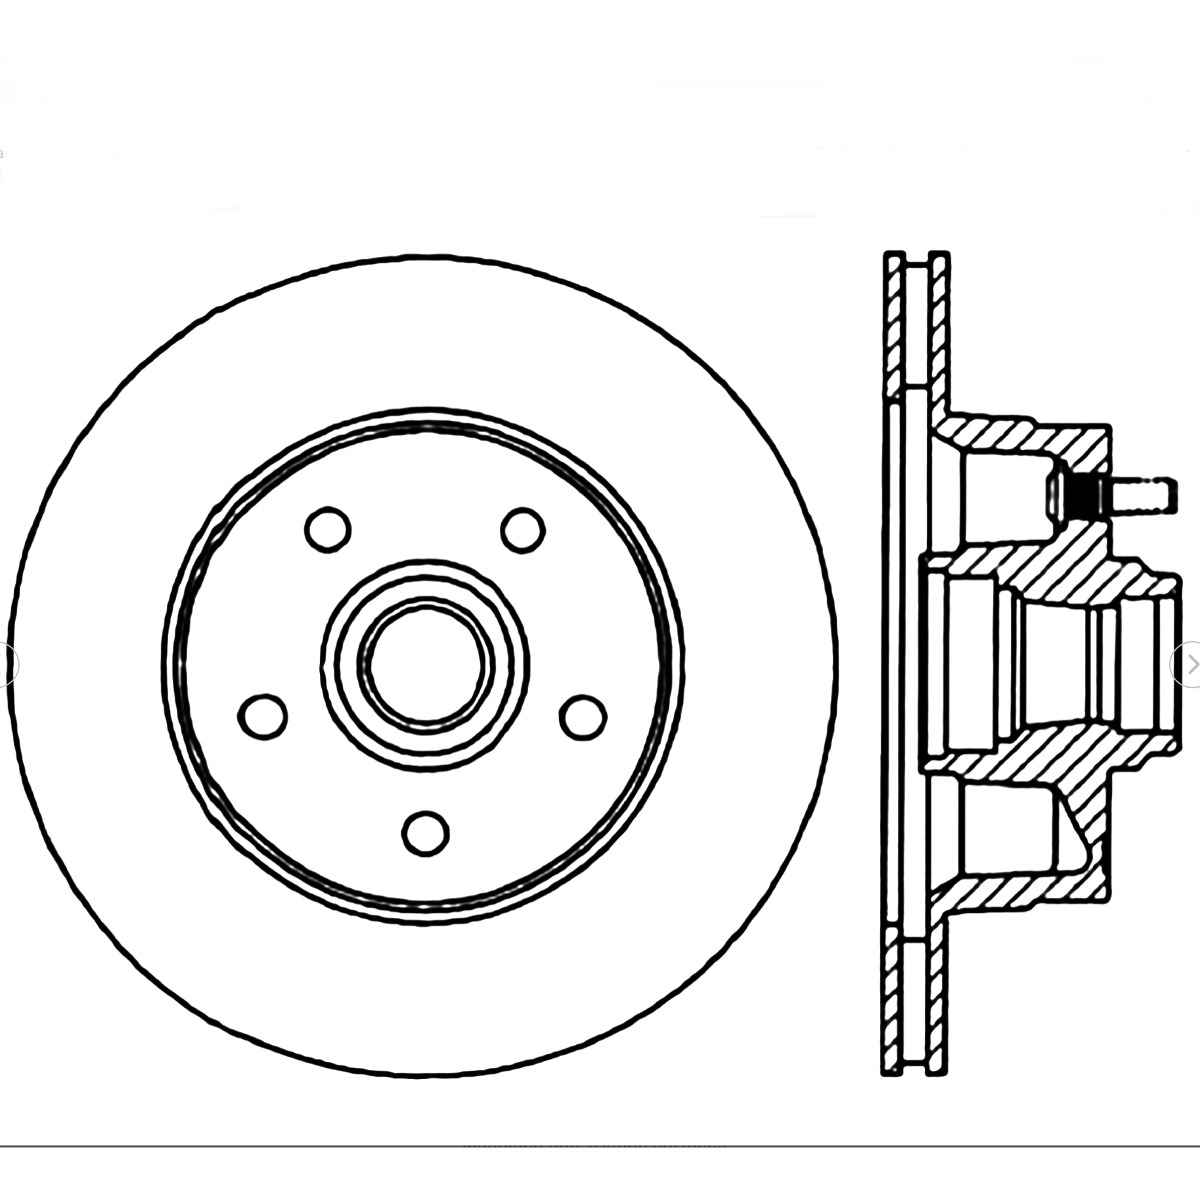 jeep sj wiring diagram database 83 CJ5 Jeep Parts jeep sj wiring diagram database jeep mander disco de freno jeep wagoneer sj 1987 delantero 49